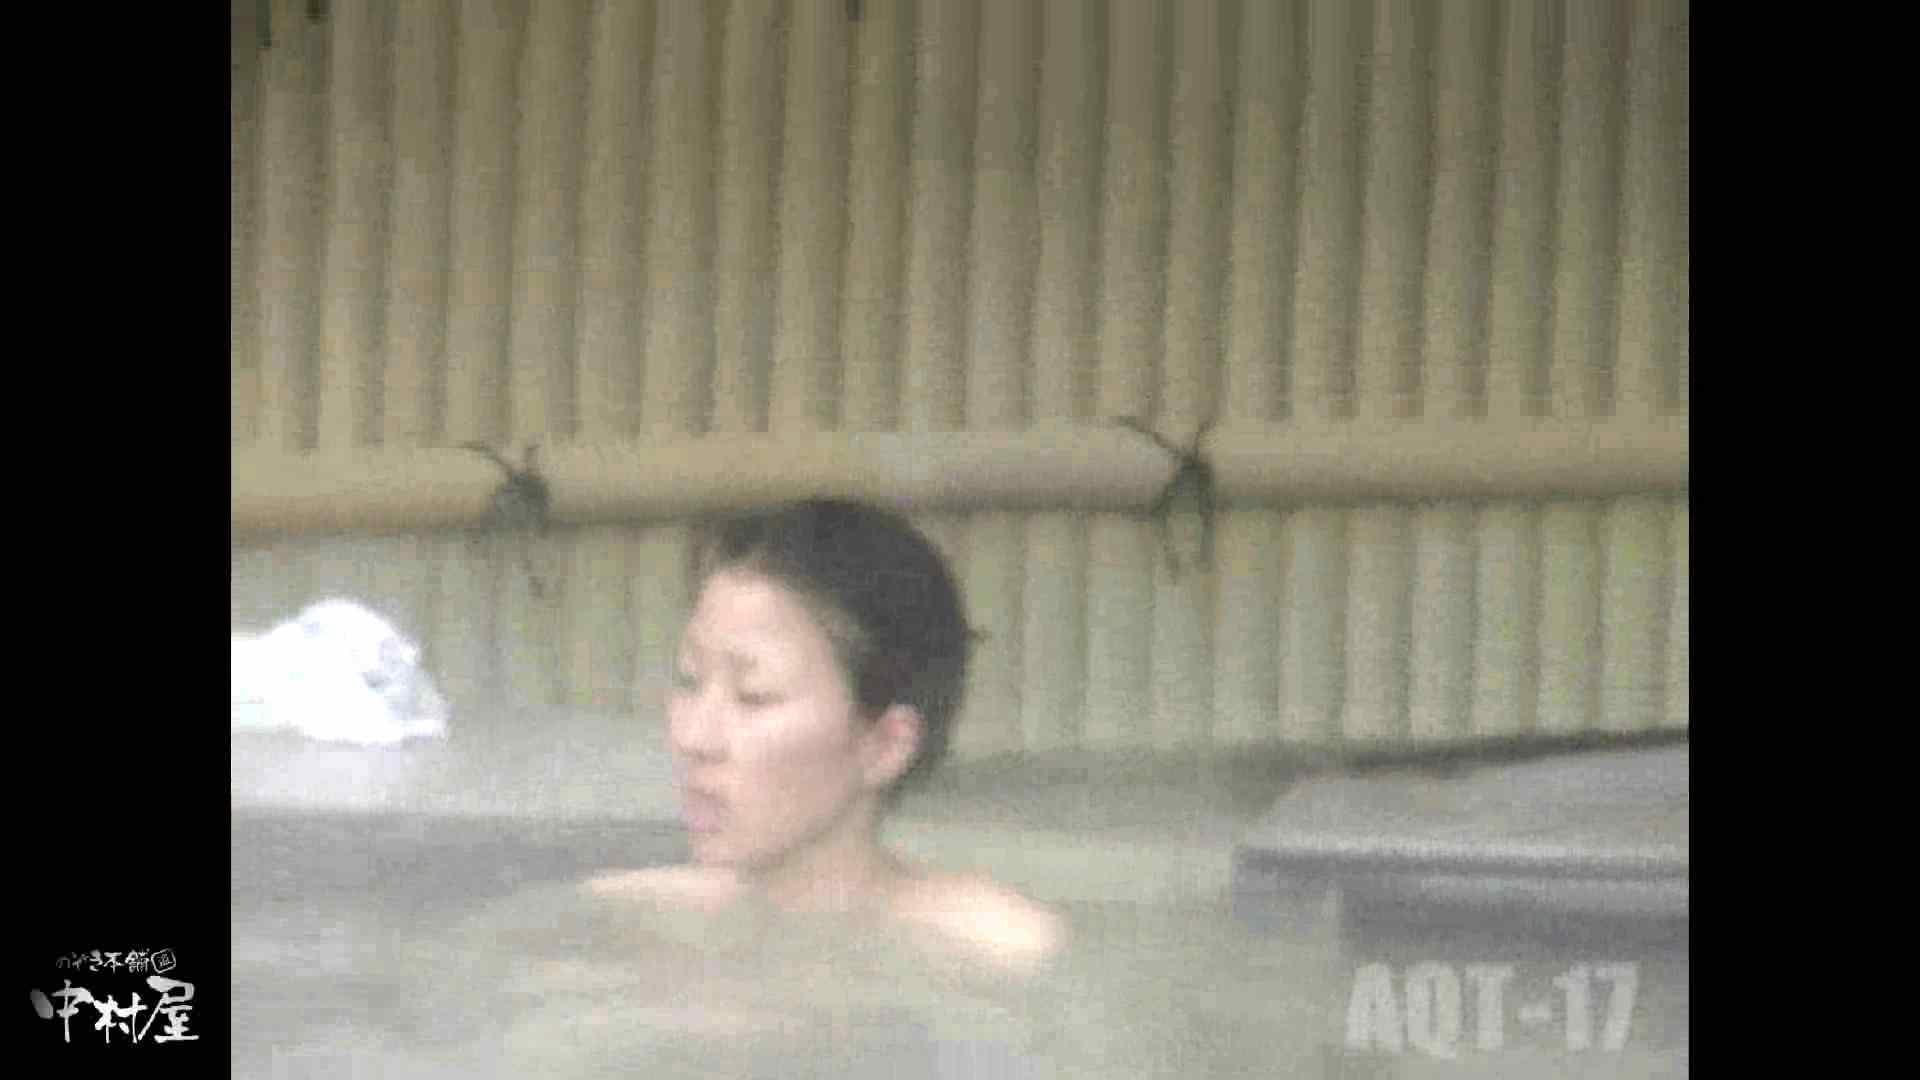 Aquaな露天風呂Vol.881潜入盗撮露天風呂十七判湯 其の二 OLのエロ生活   露天風呂  60連発 1